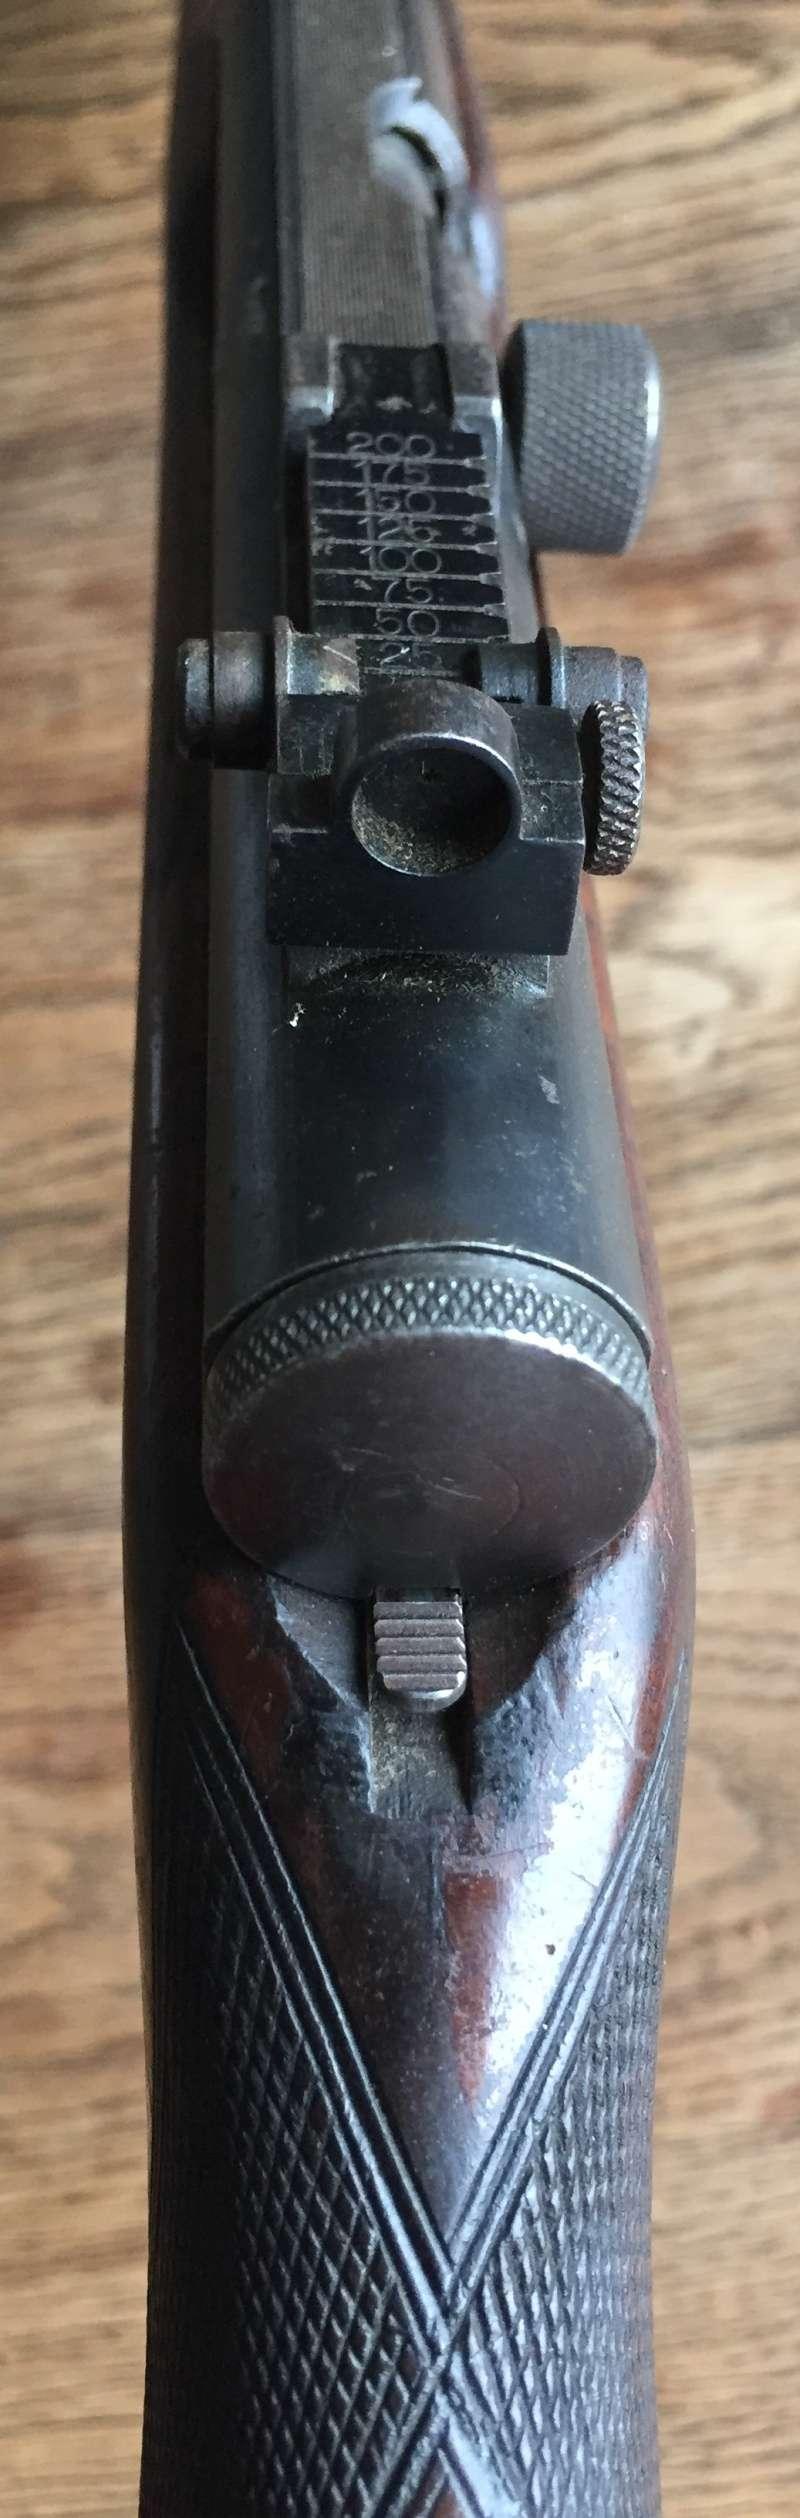 Carabine 22lr MAS 50 [identifiee] Image38